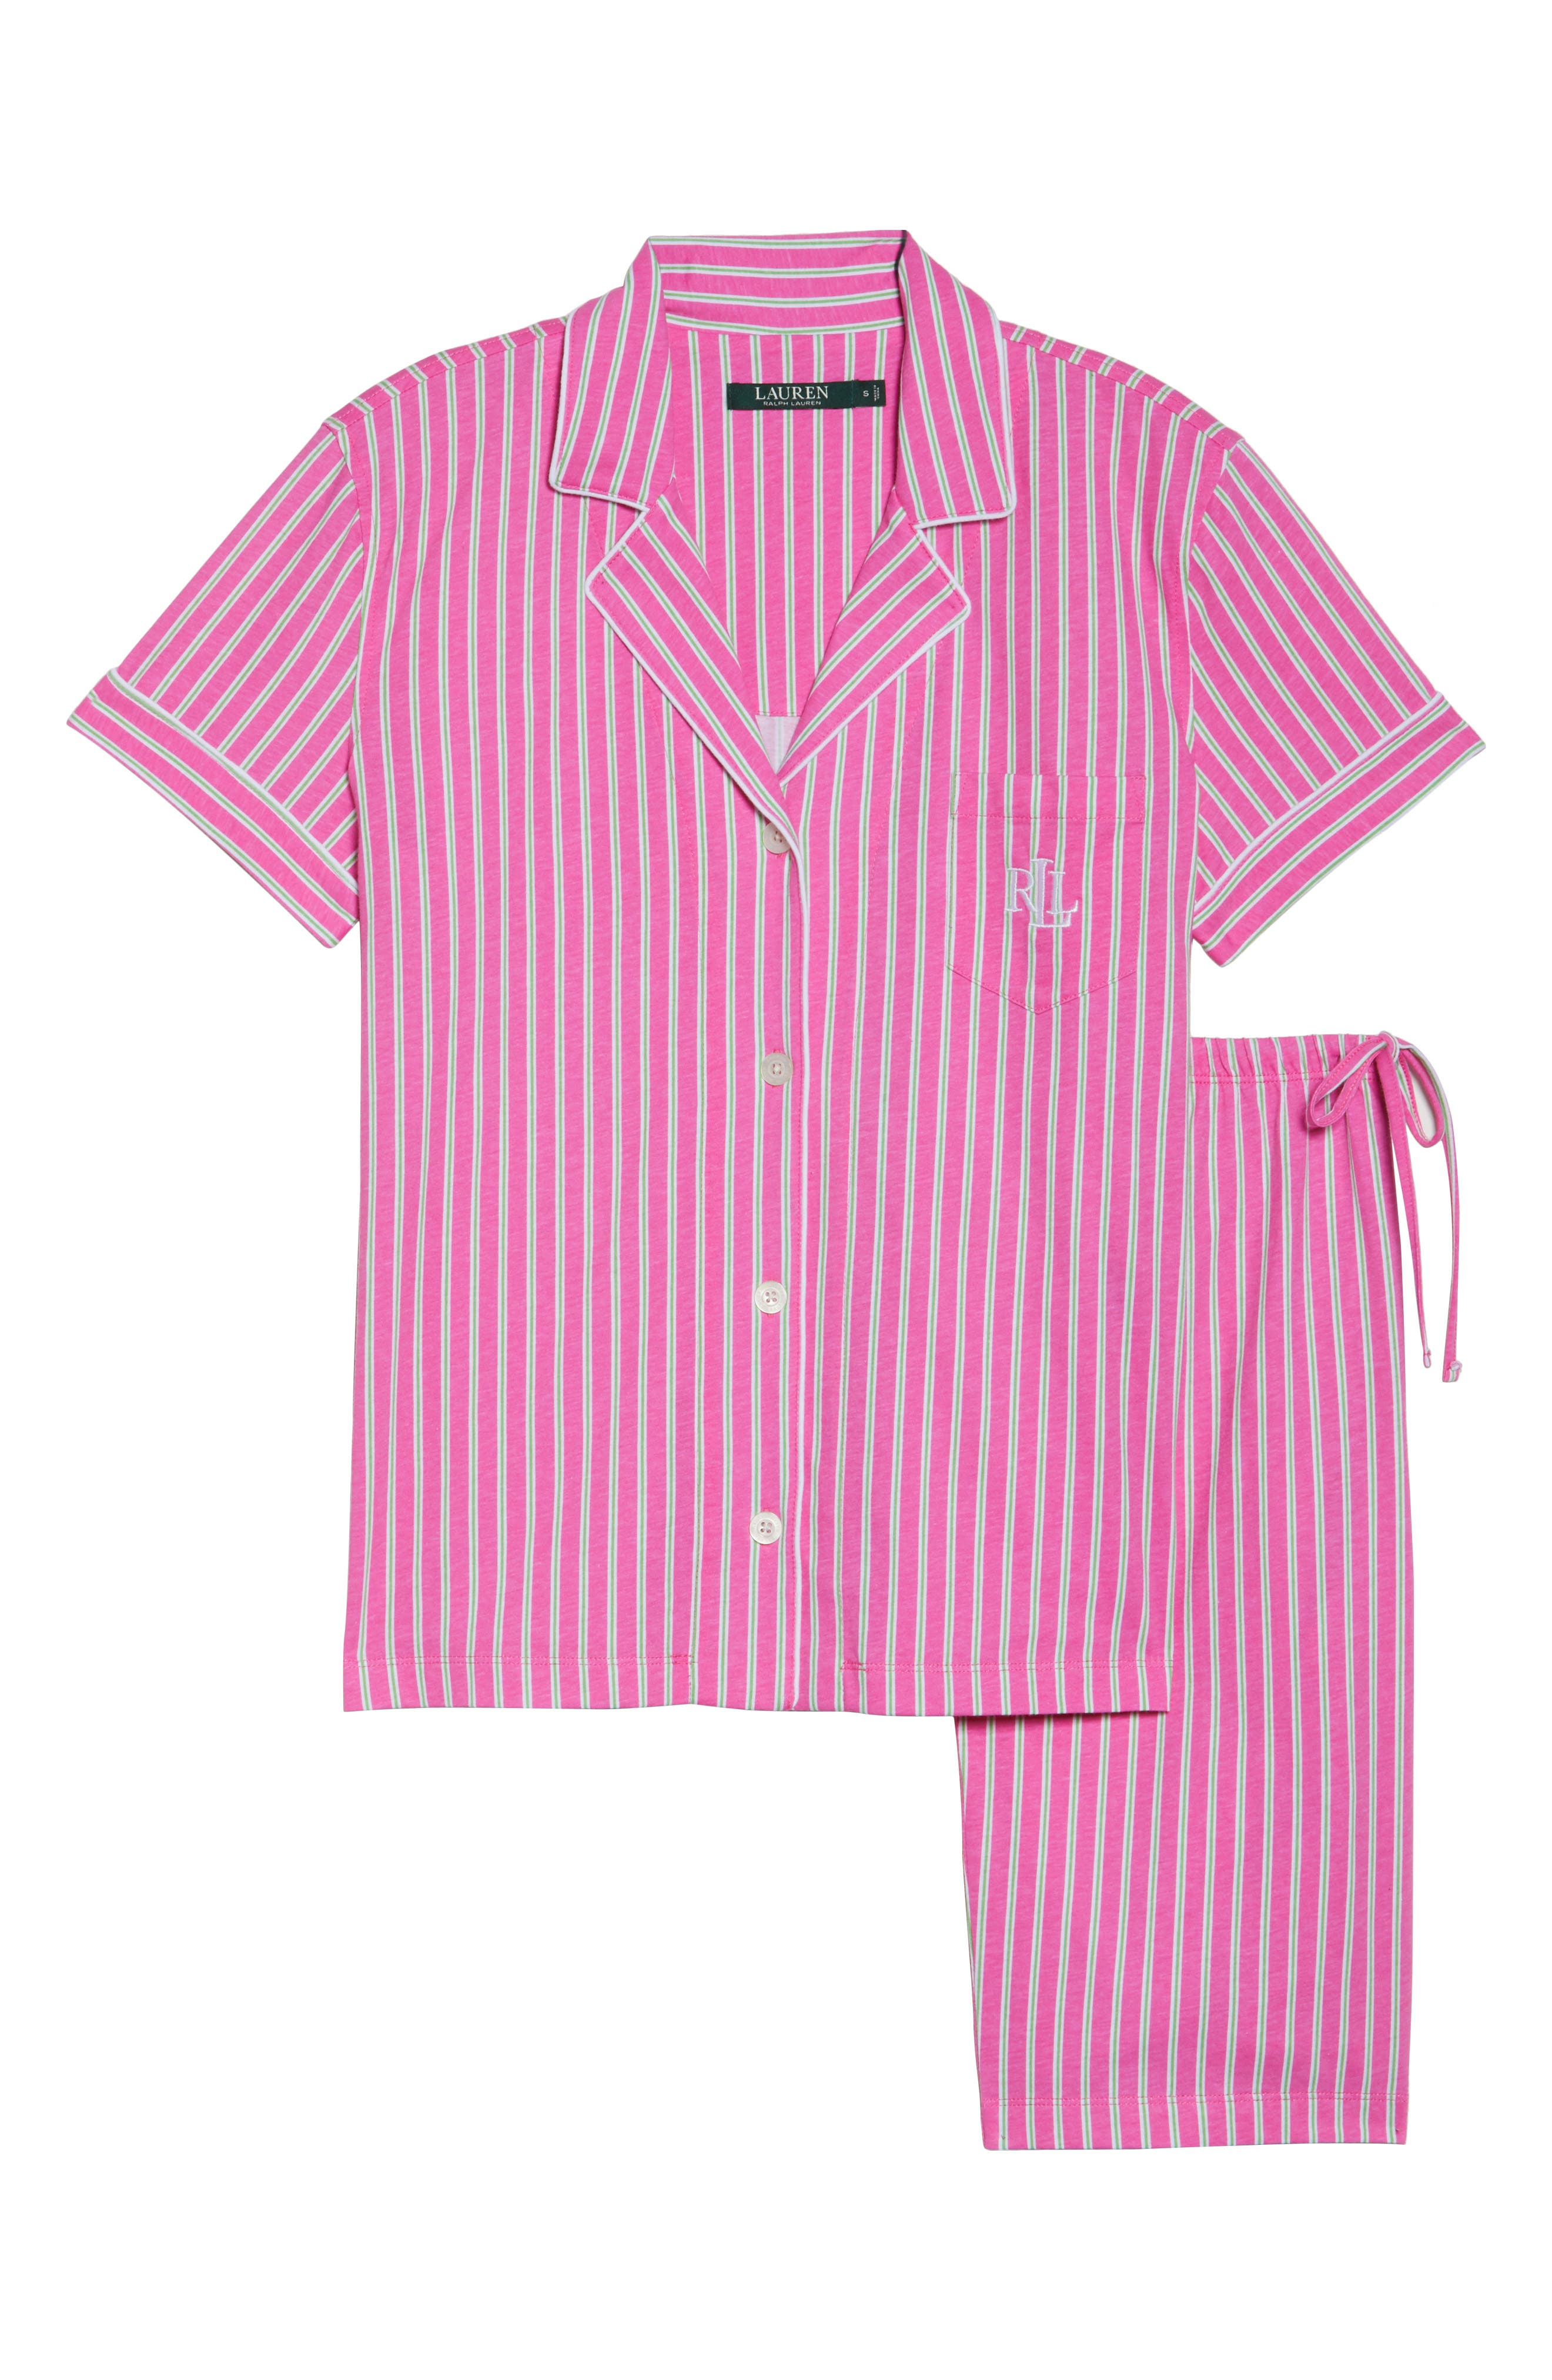 Bermuda Pajamas,                             Alternate thumbnail 6, color,                             674